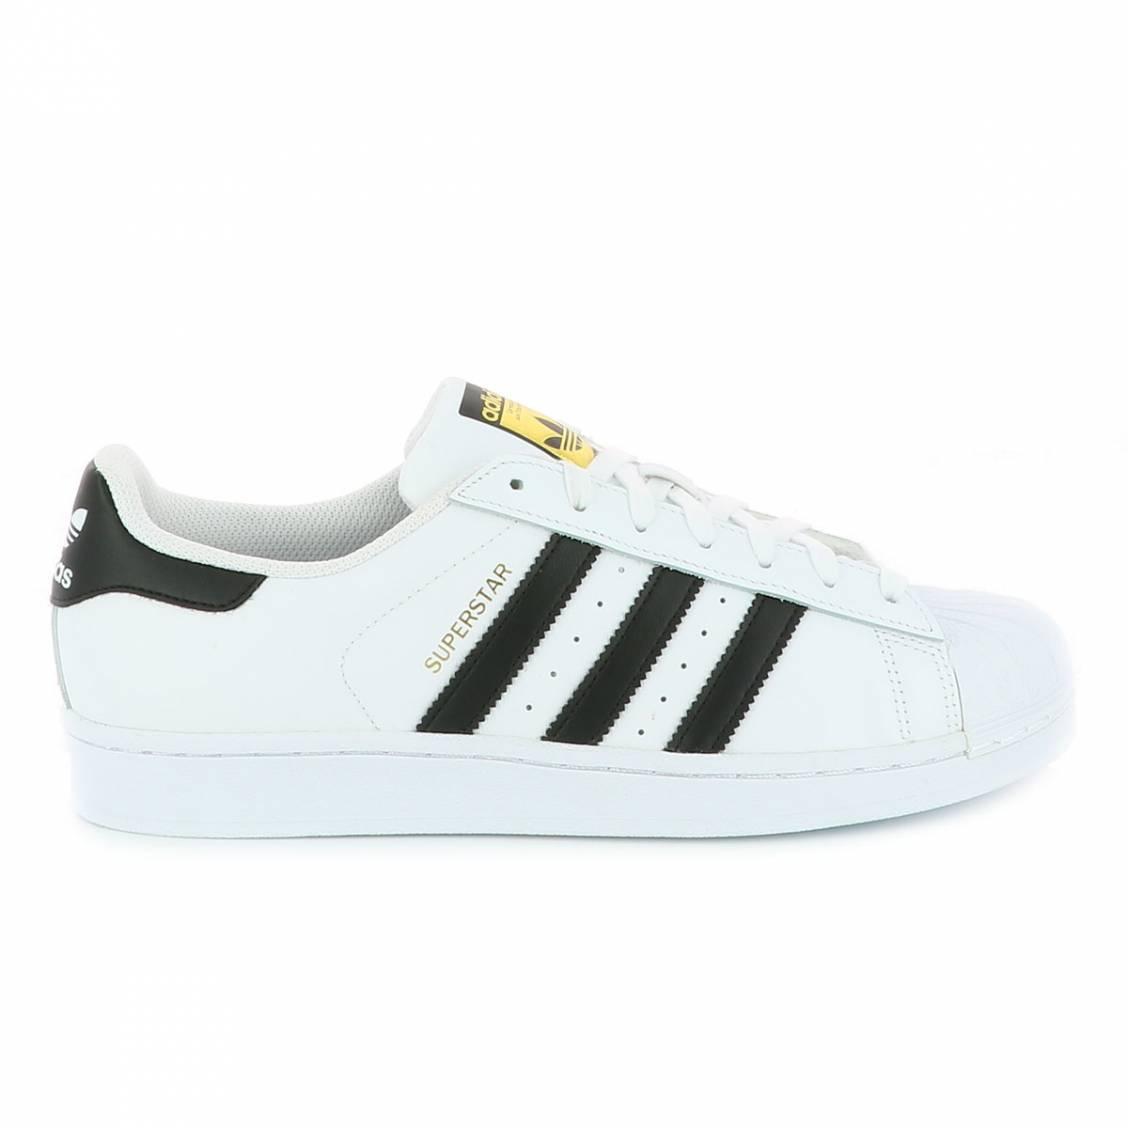 Baskets Adidas Superstar en cuir pleine fleur blanc